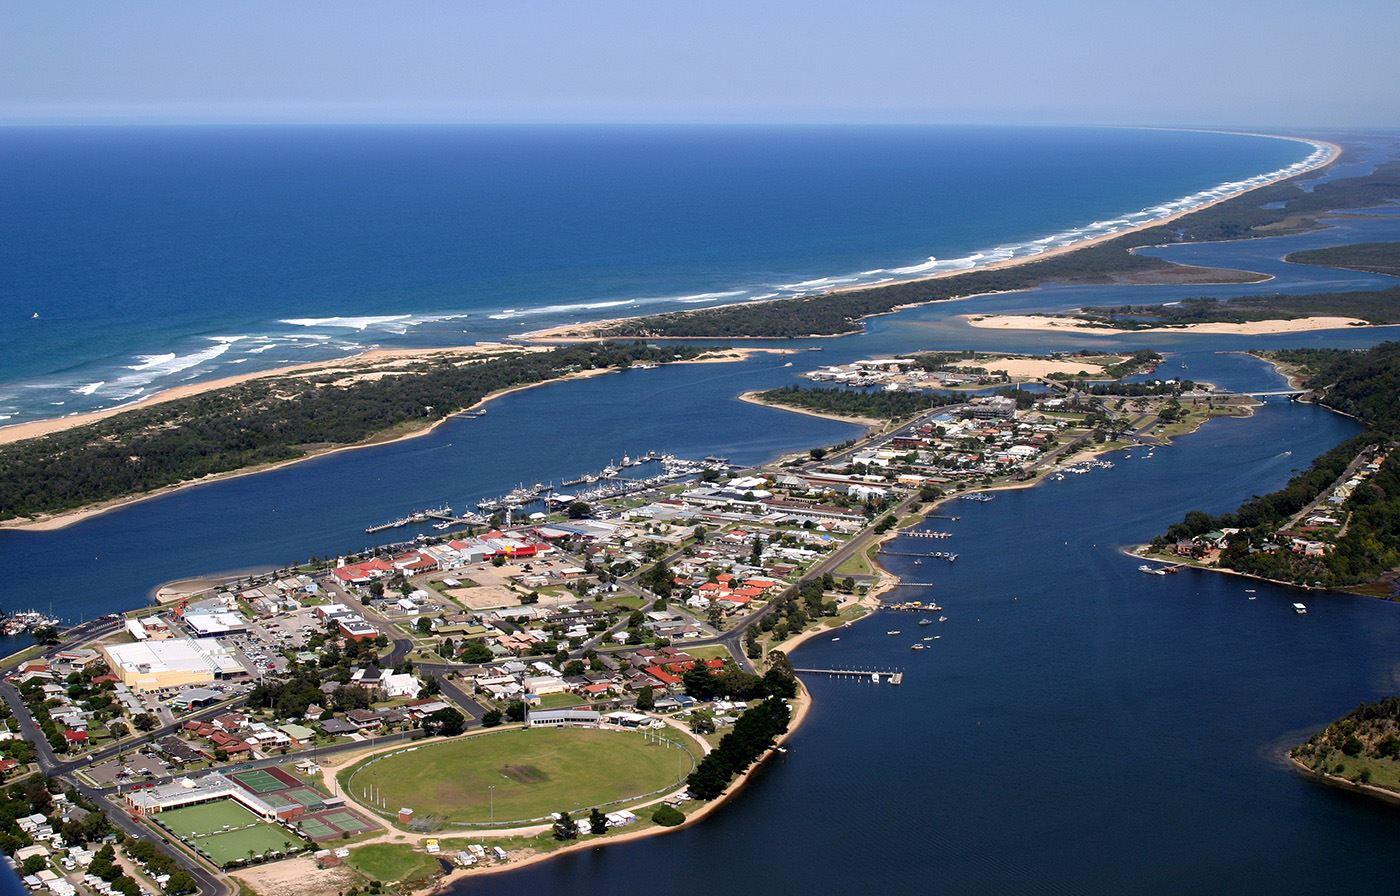 Australian Beach Games Lakes Entrance